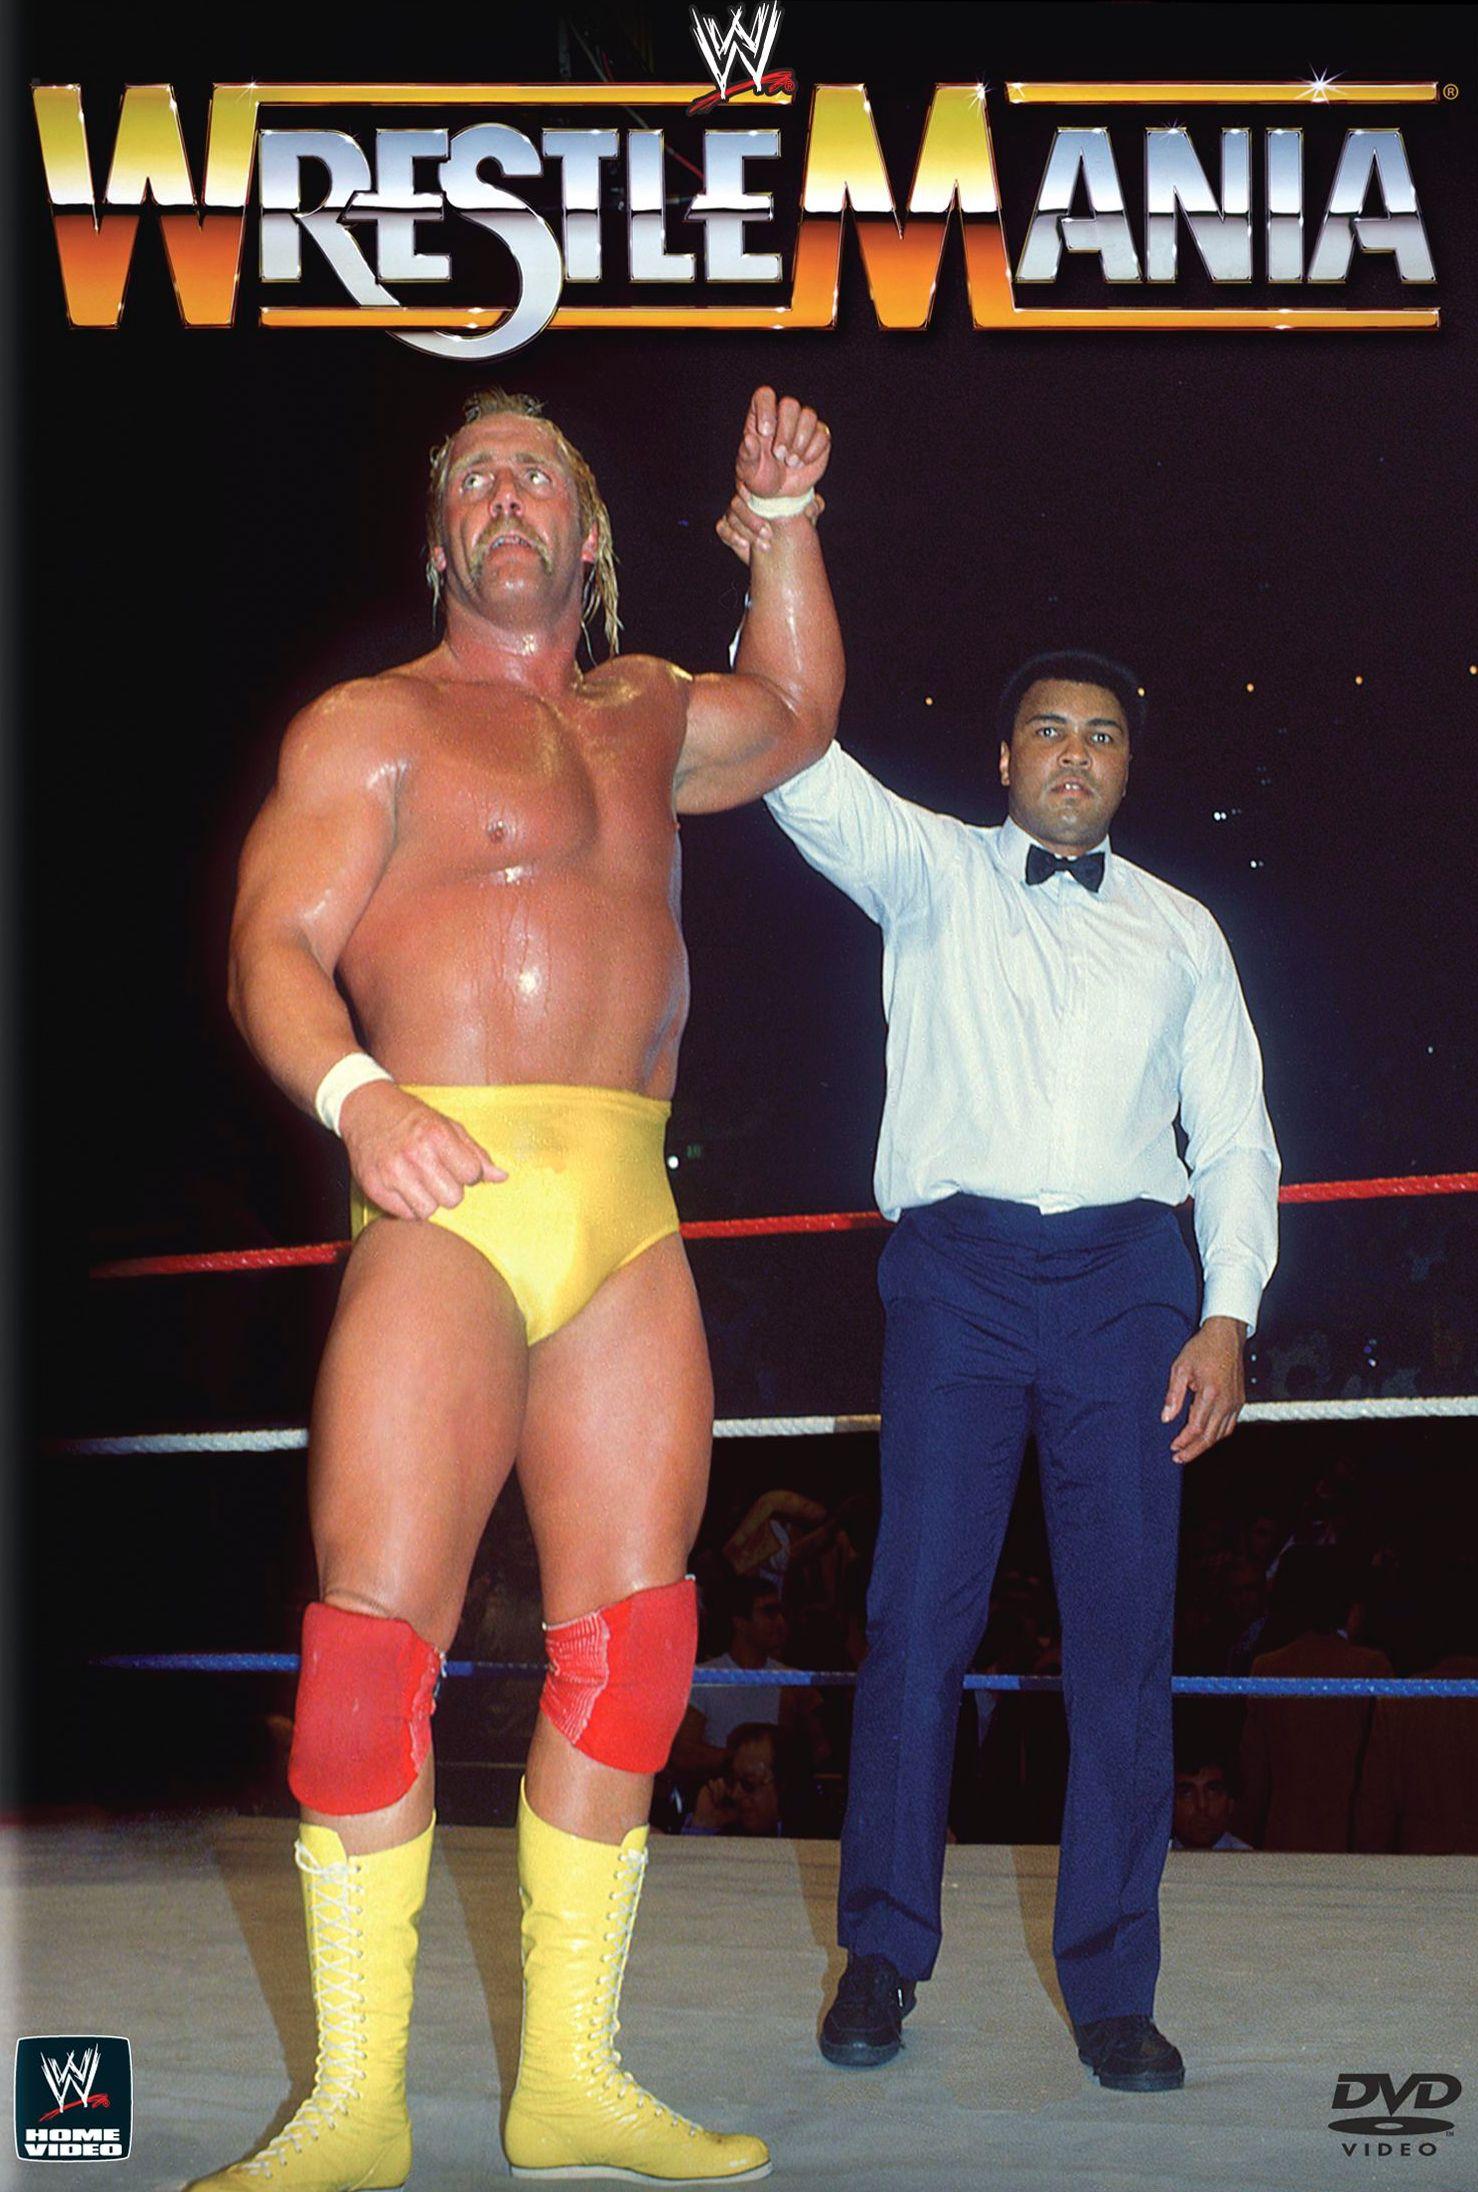 WWE: Wrestlemania I